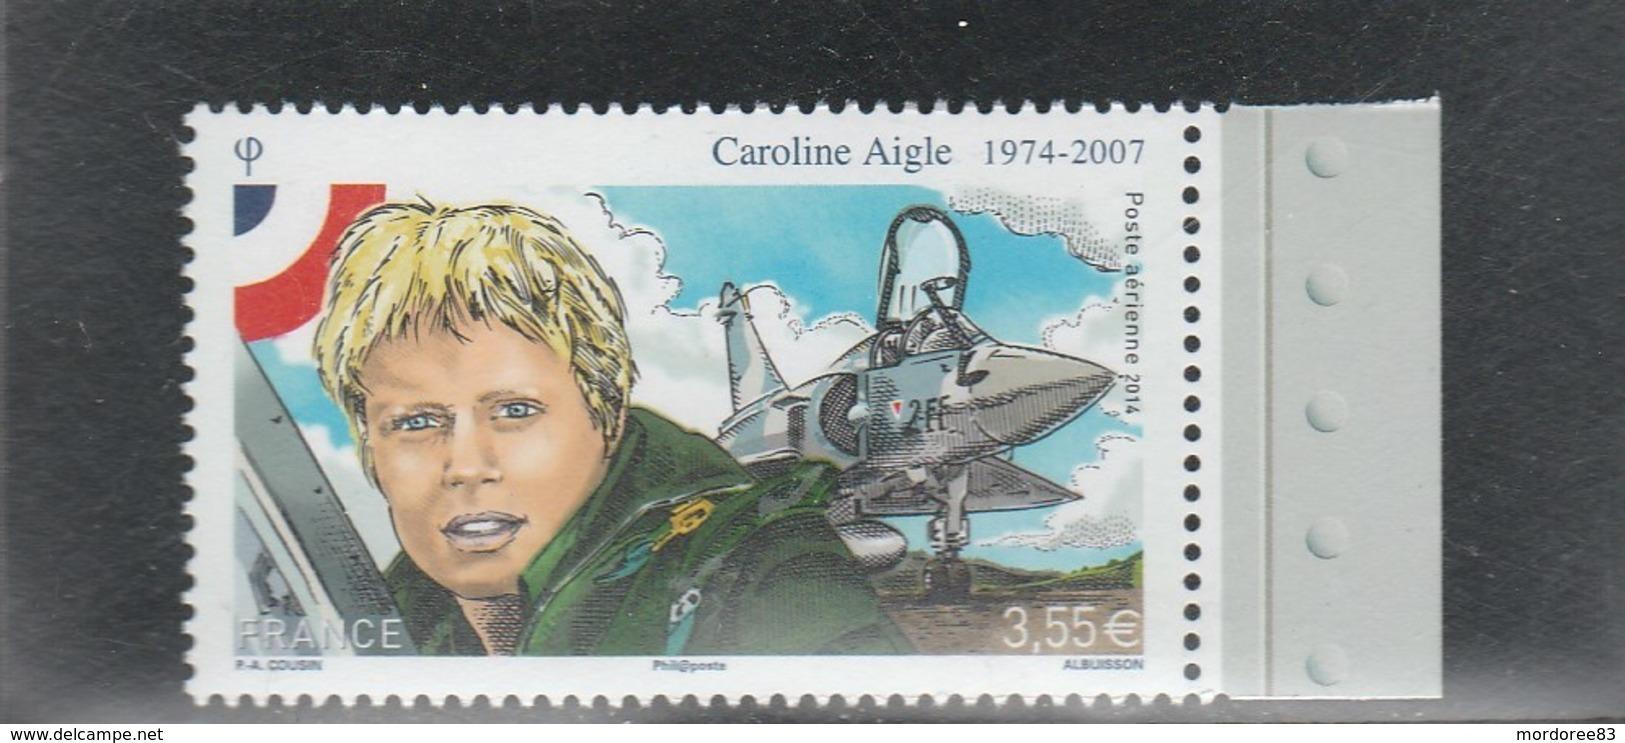 FRANCE 2014 CAROLINE AIGLE POSTE AERIENNE NEUF** - PA78a - PA 78a - - 1960-.... Neufs